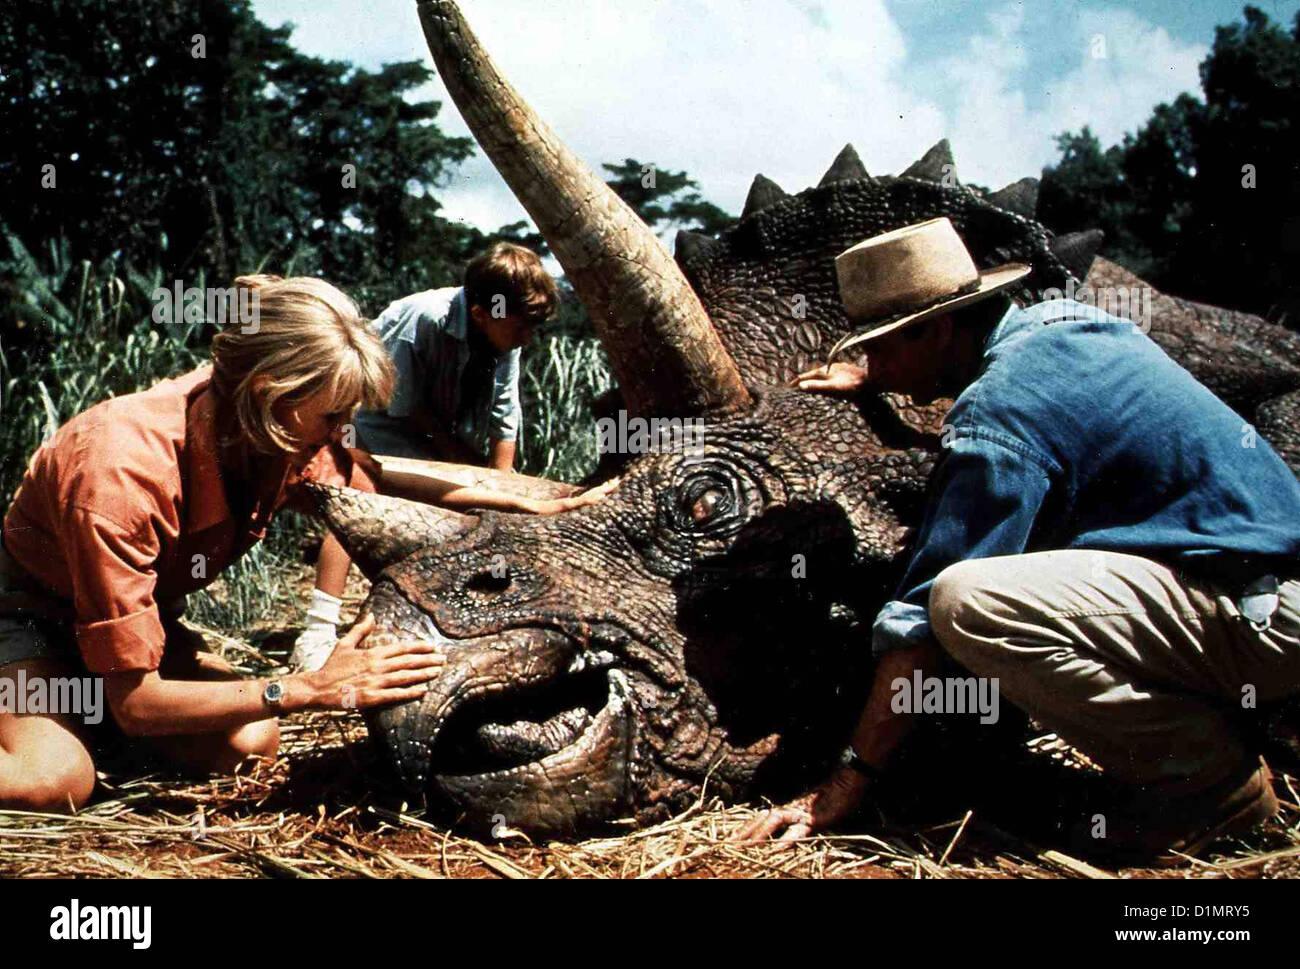 Jurassic Park  Jurassic Park - Hr  Laura Dern, Joseph Mazzello, Sam Neill *** Local Caption *** 1993 Universal Pic., - Stock Image